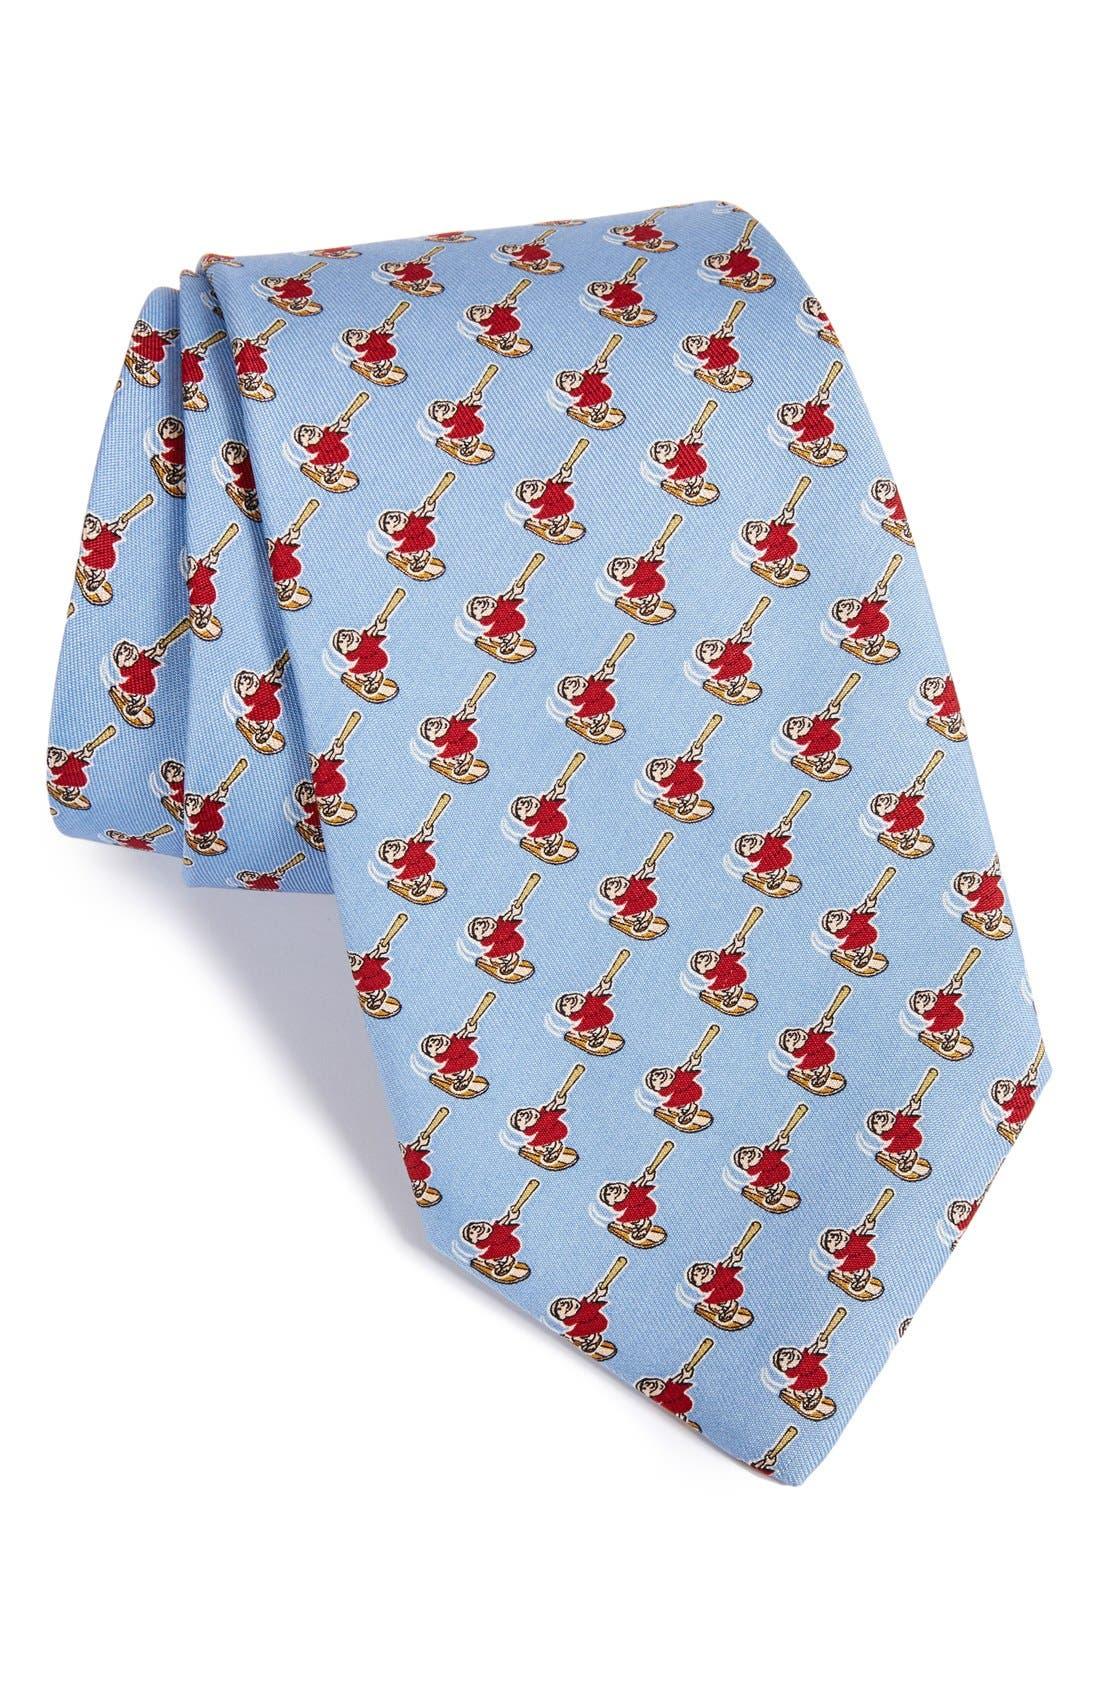 'San Diego Padres - MLB' Print Silk Tie,                         Main,                         color, Periwinkle